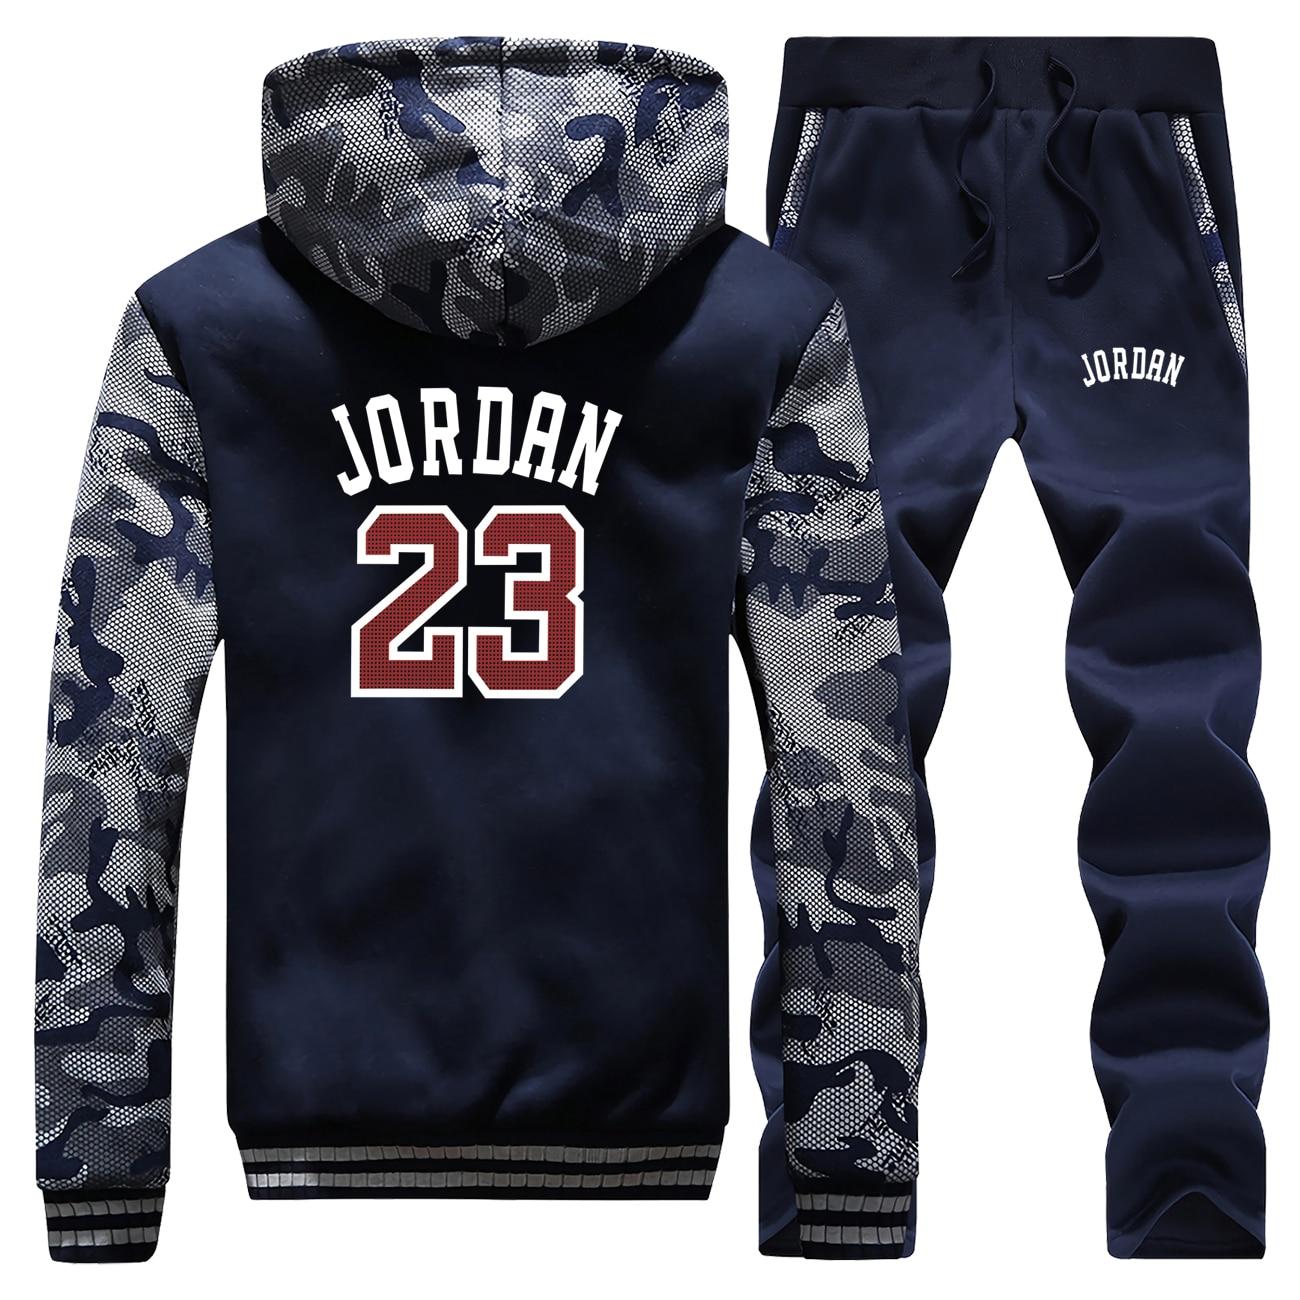 Jordan 23 Printed Mens Jacket+SweatPants 2 Piece Set Men Hoodies Thick Warm Zipper Coats Autumn Winter New Tracksuit Male Hoodie